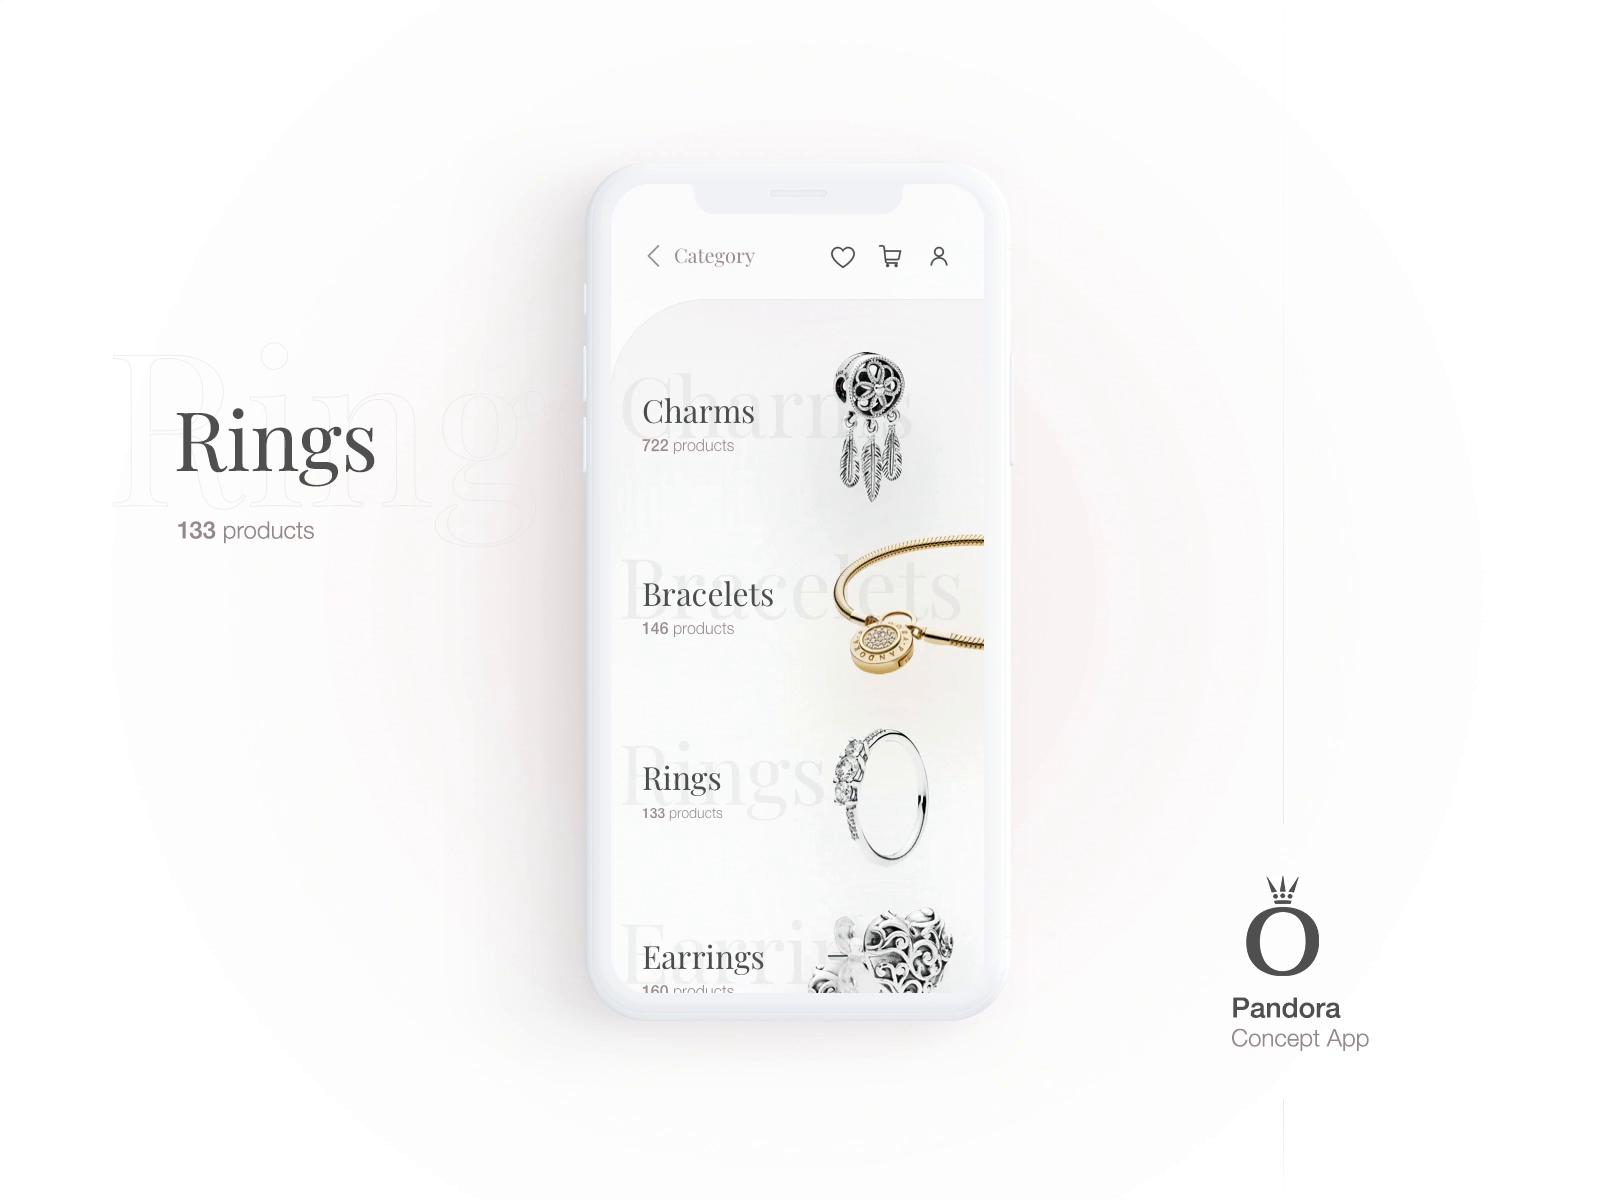 Pandora App Category Screen by Krystian Bieda (con immagini)